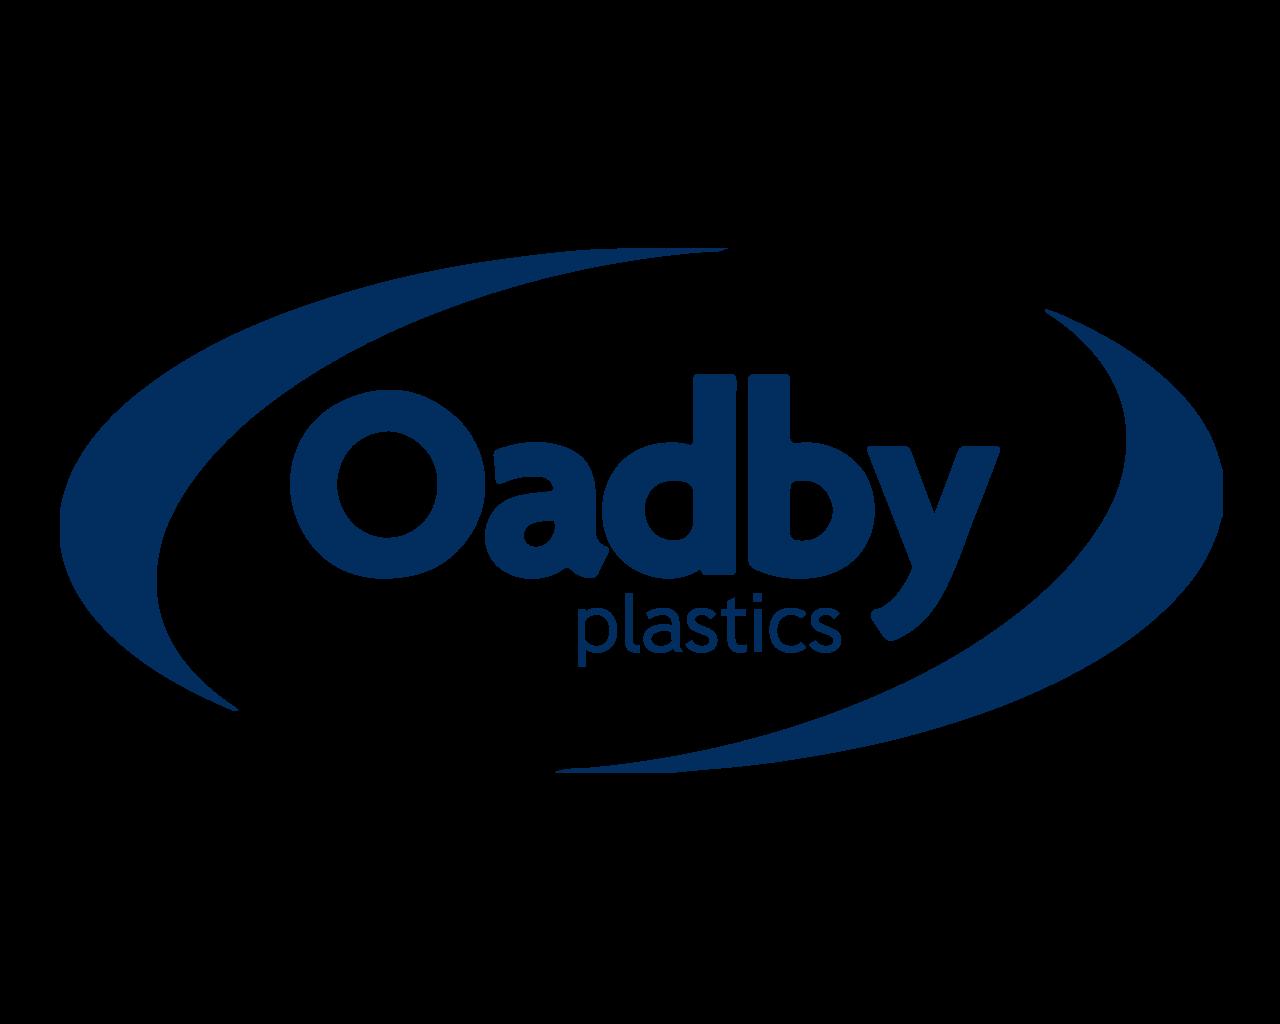 Oadby-Plastics